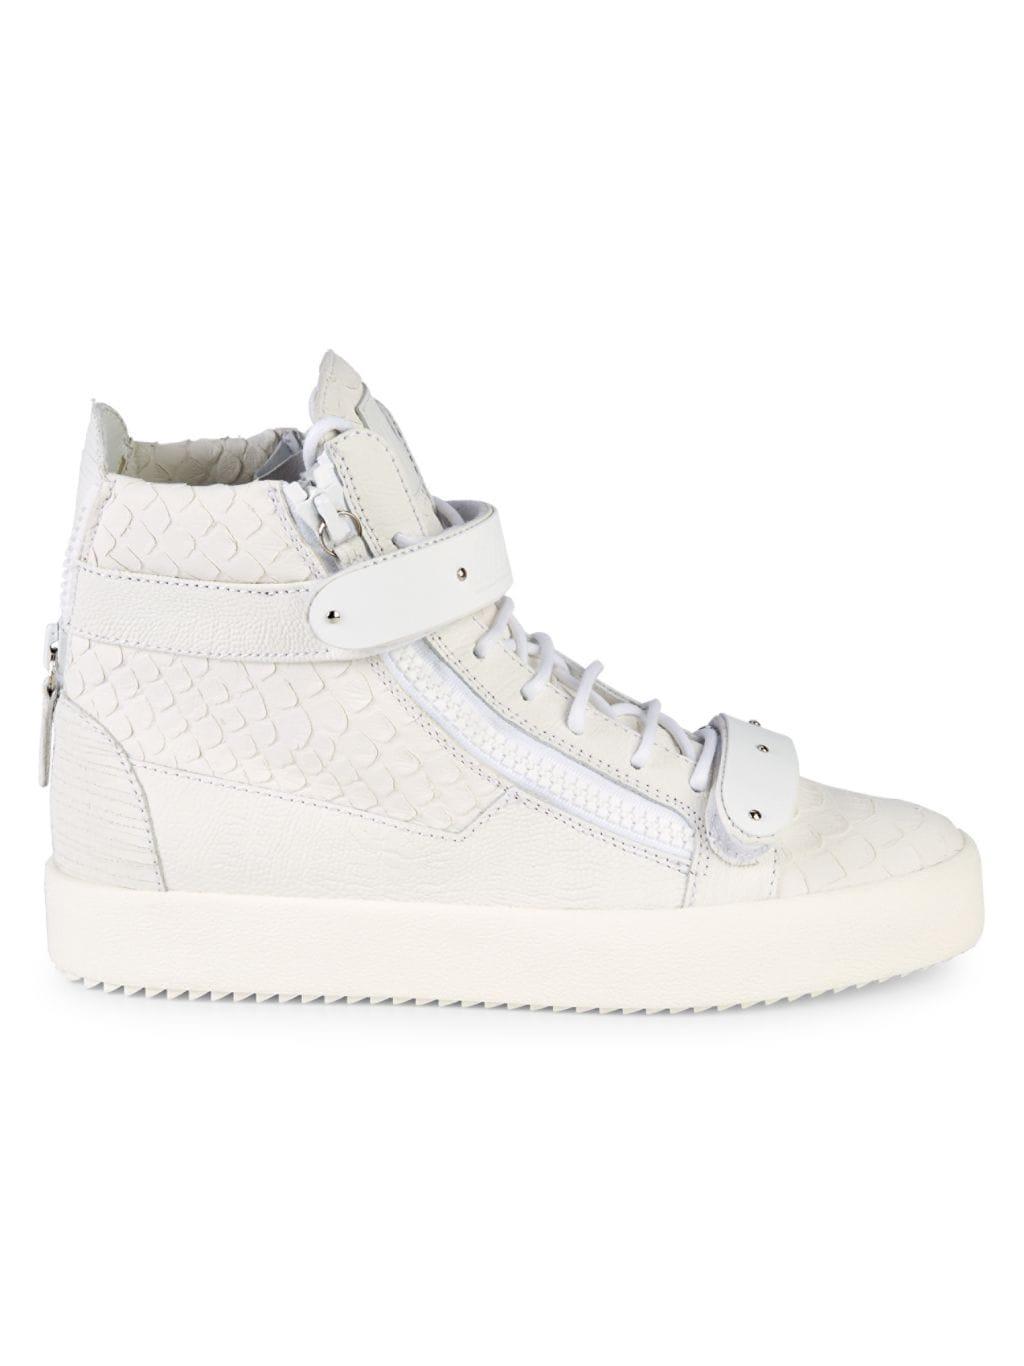 Giuseppe Zanotti Embossed Snakeskin-Print Leather High-Top Sneakers